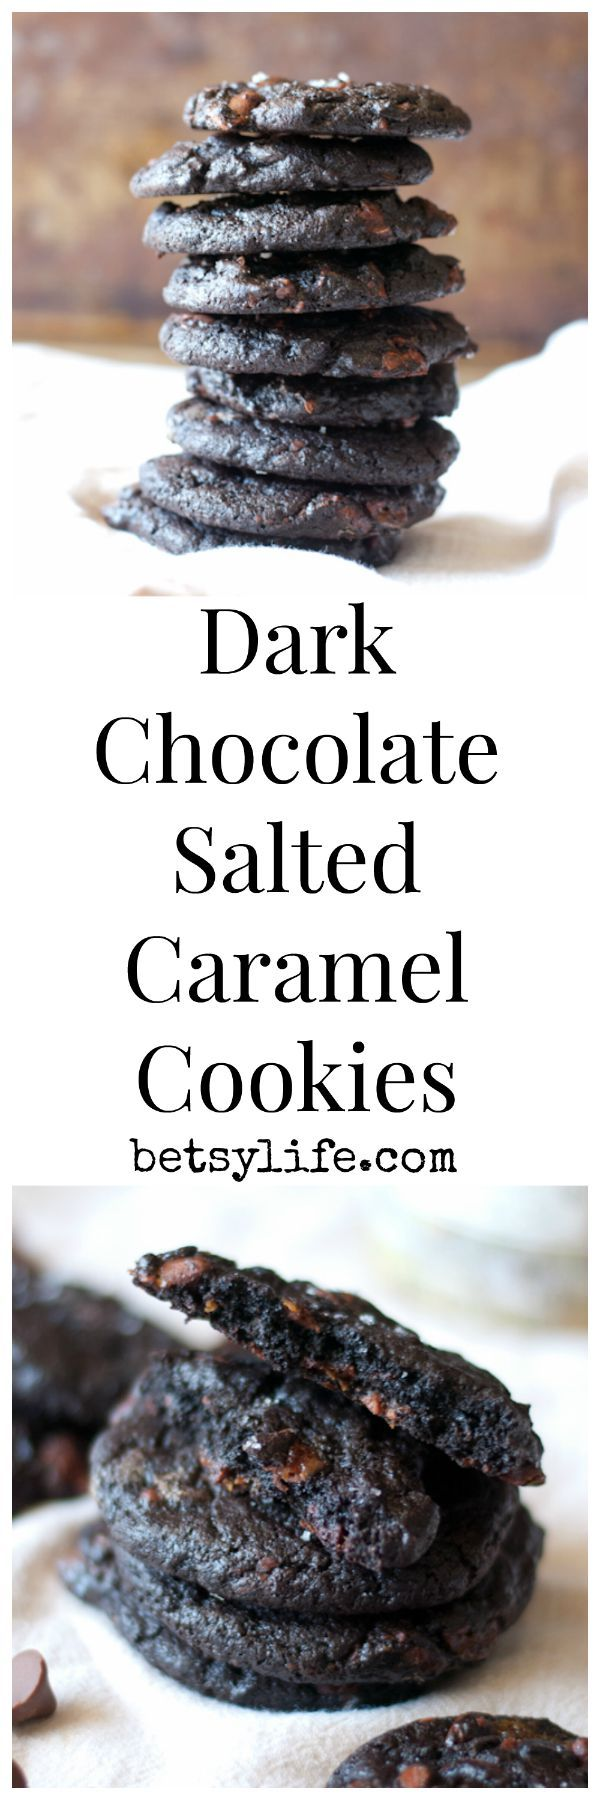 Dark Chocolate Salted Caramel Cookies | Betsylife.com